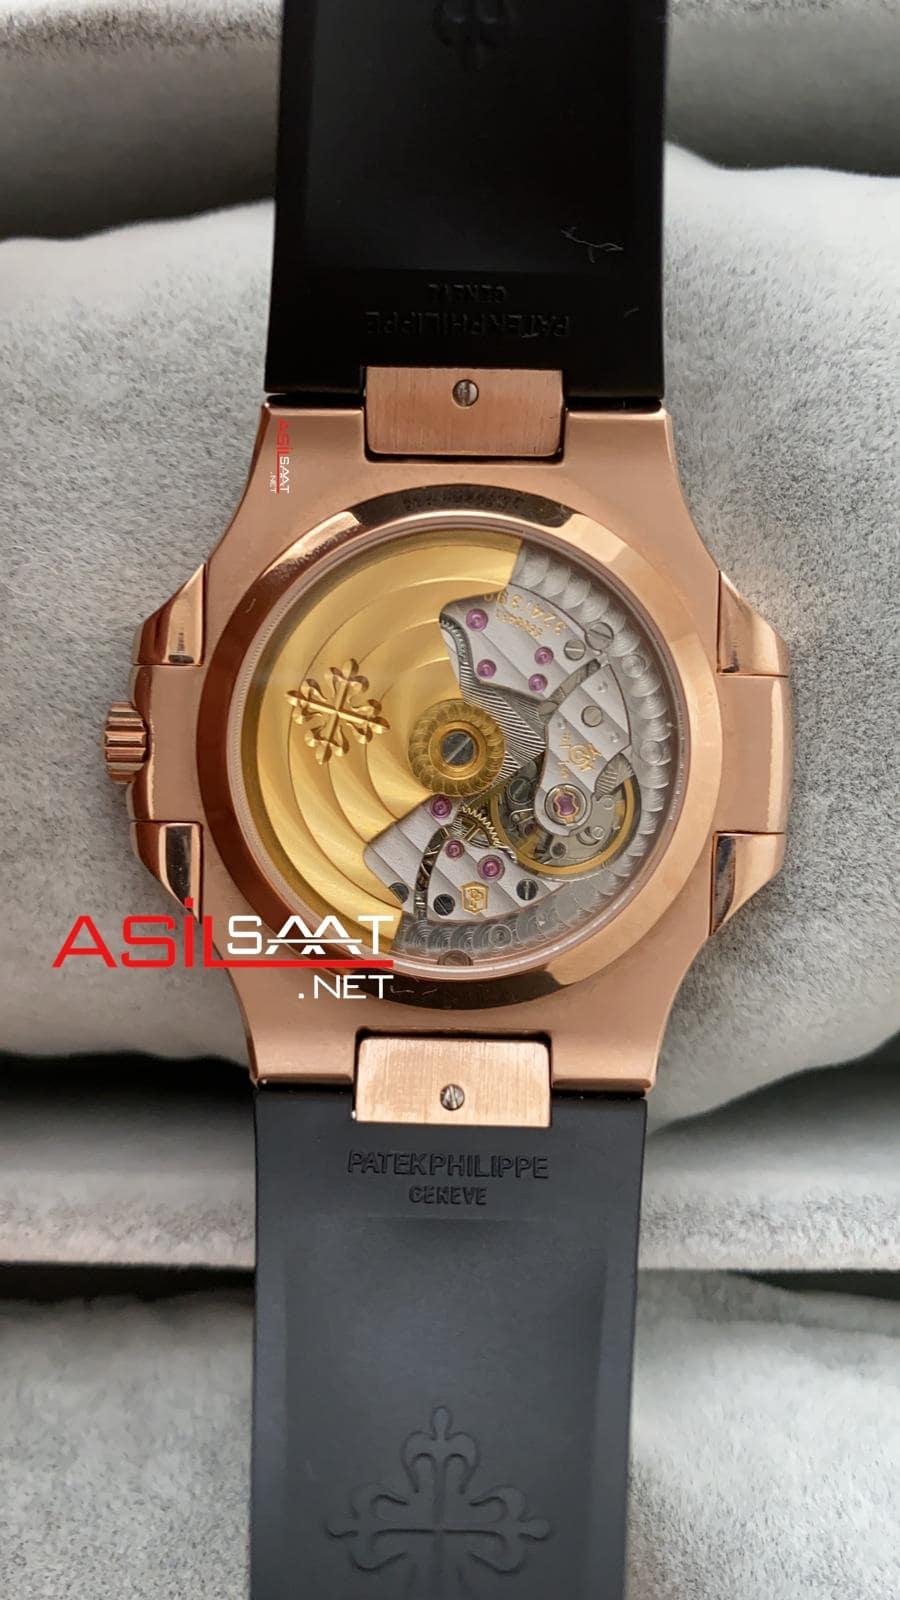 Patek Philippe Nautilus Rosegold İşlemeli Kasa Replika Saat PPNA035